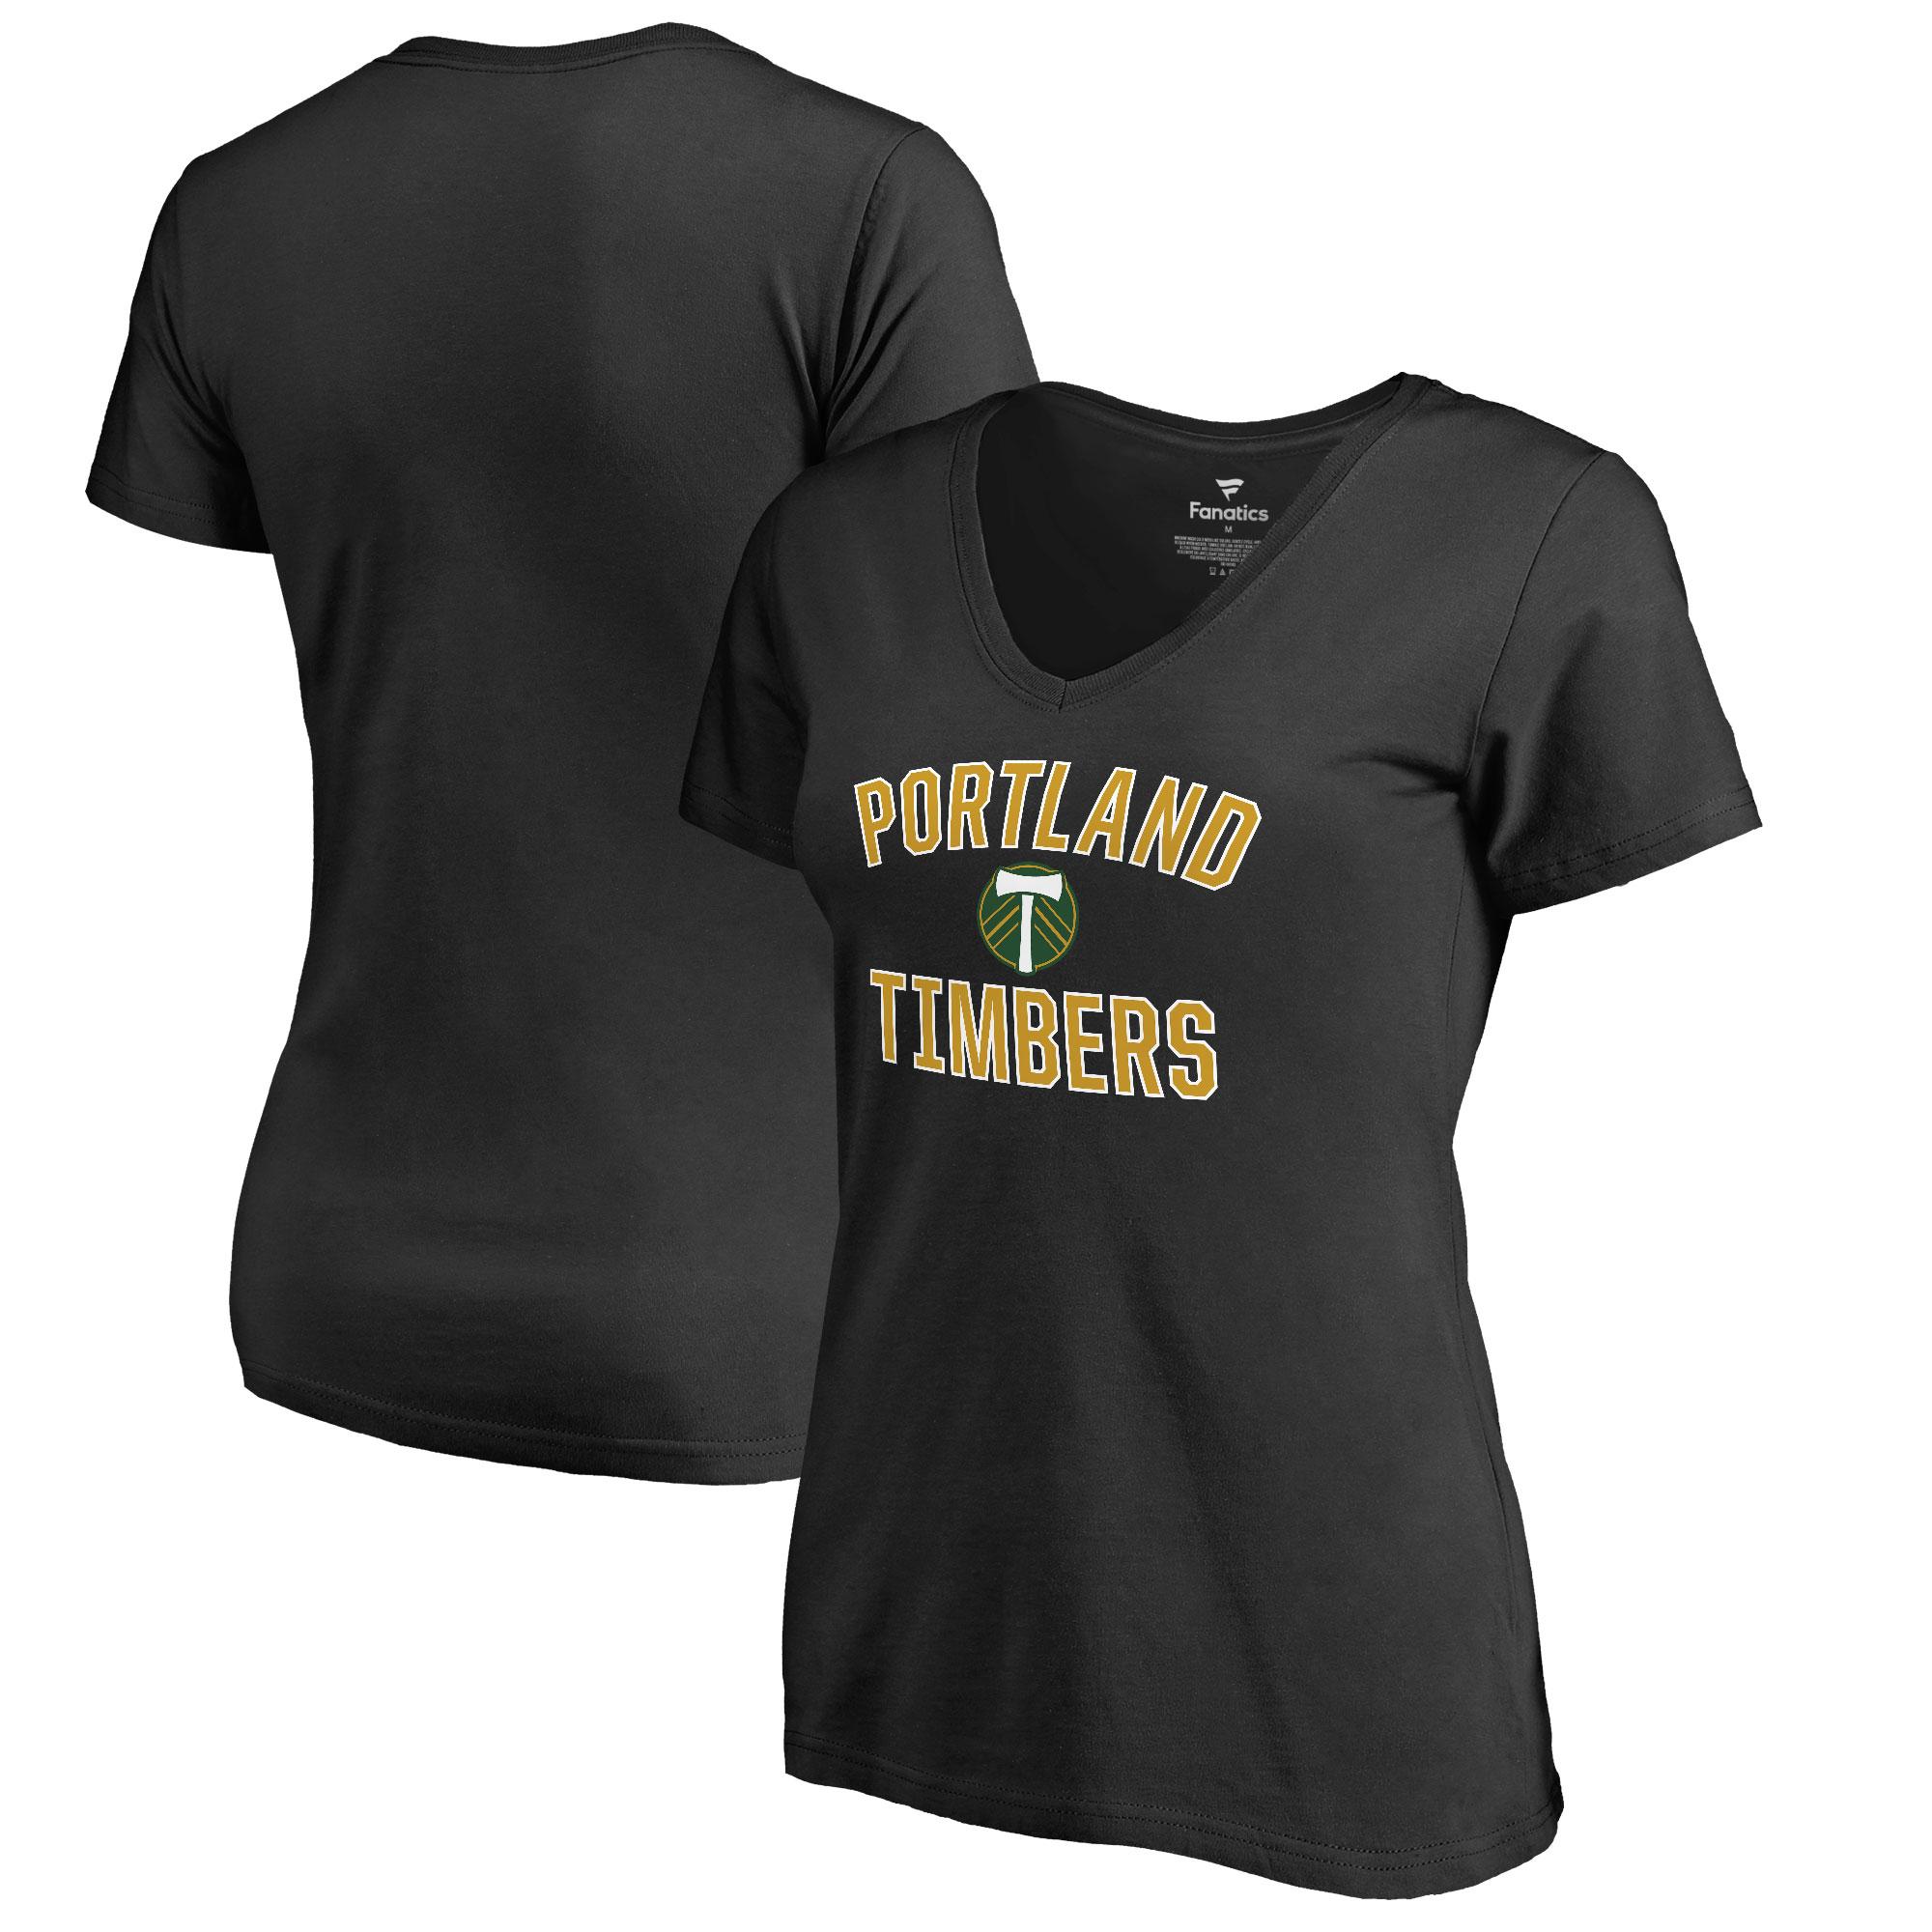 Portland Timbers Fanatics Branded Women's Victory Arch V-Neck T-Shirt - Black